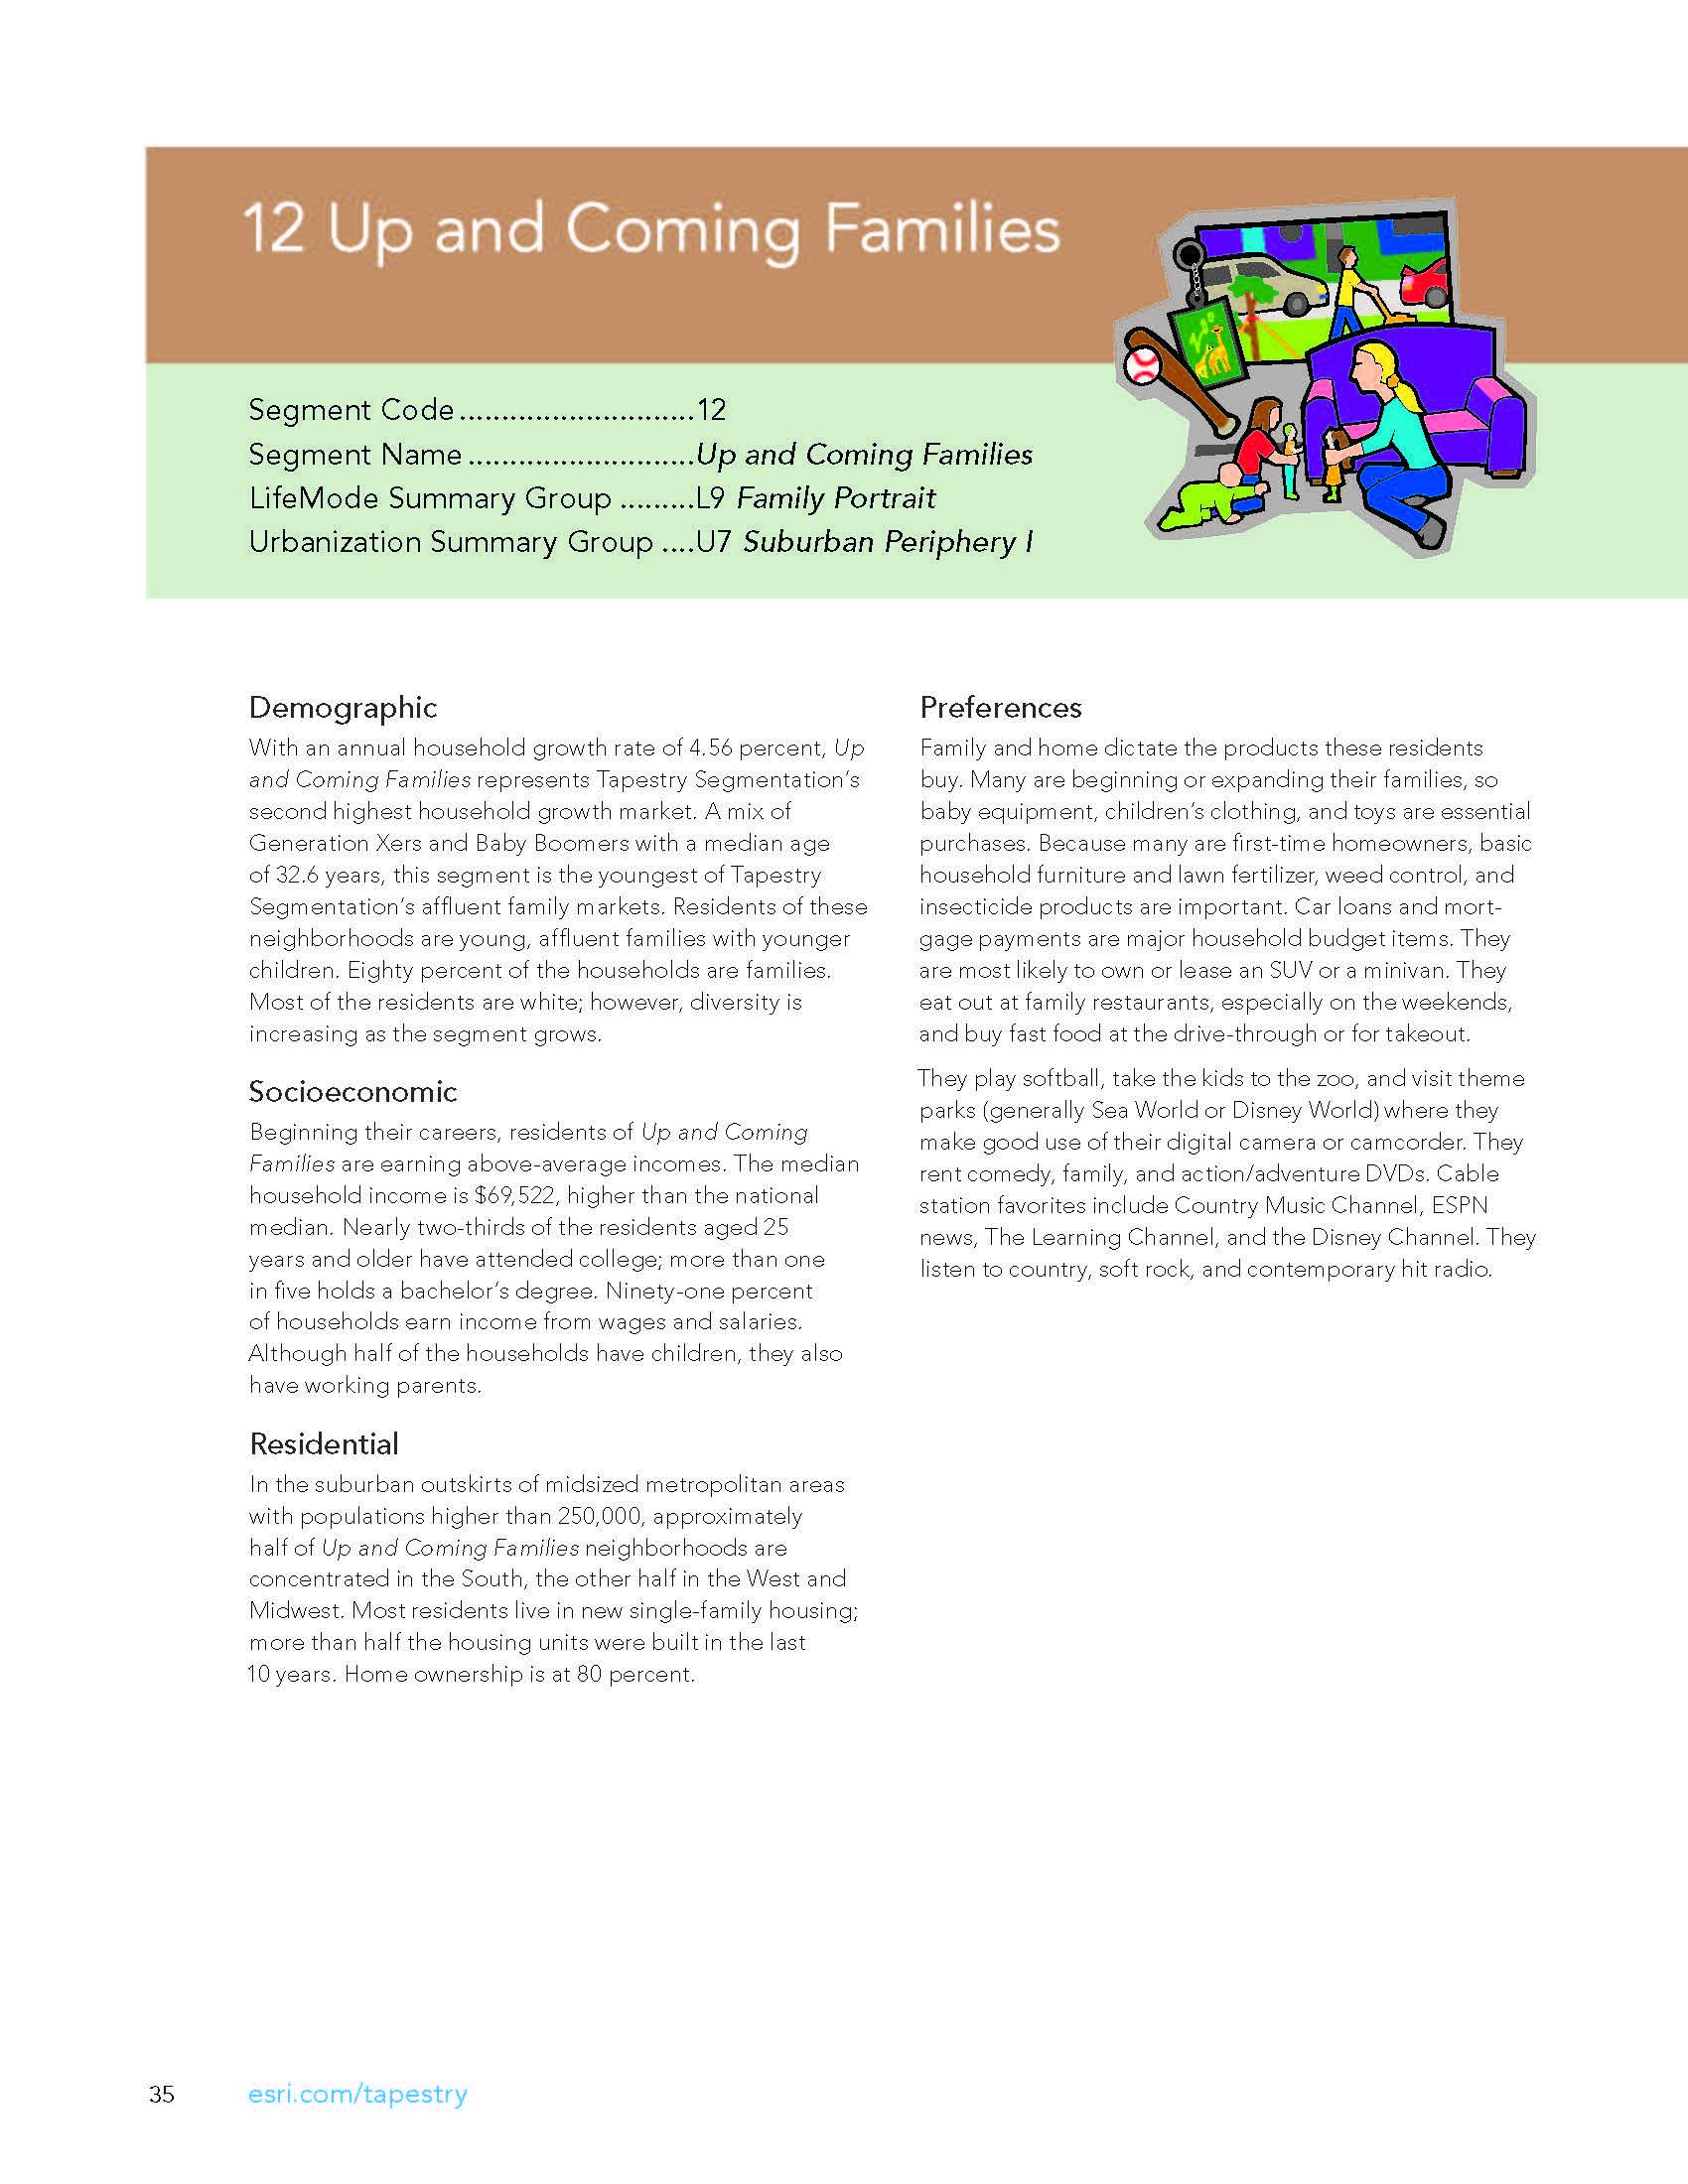 tapestry-segmentation_Page_38.jpg